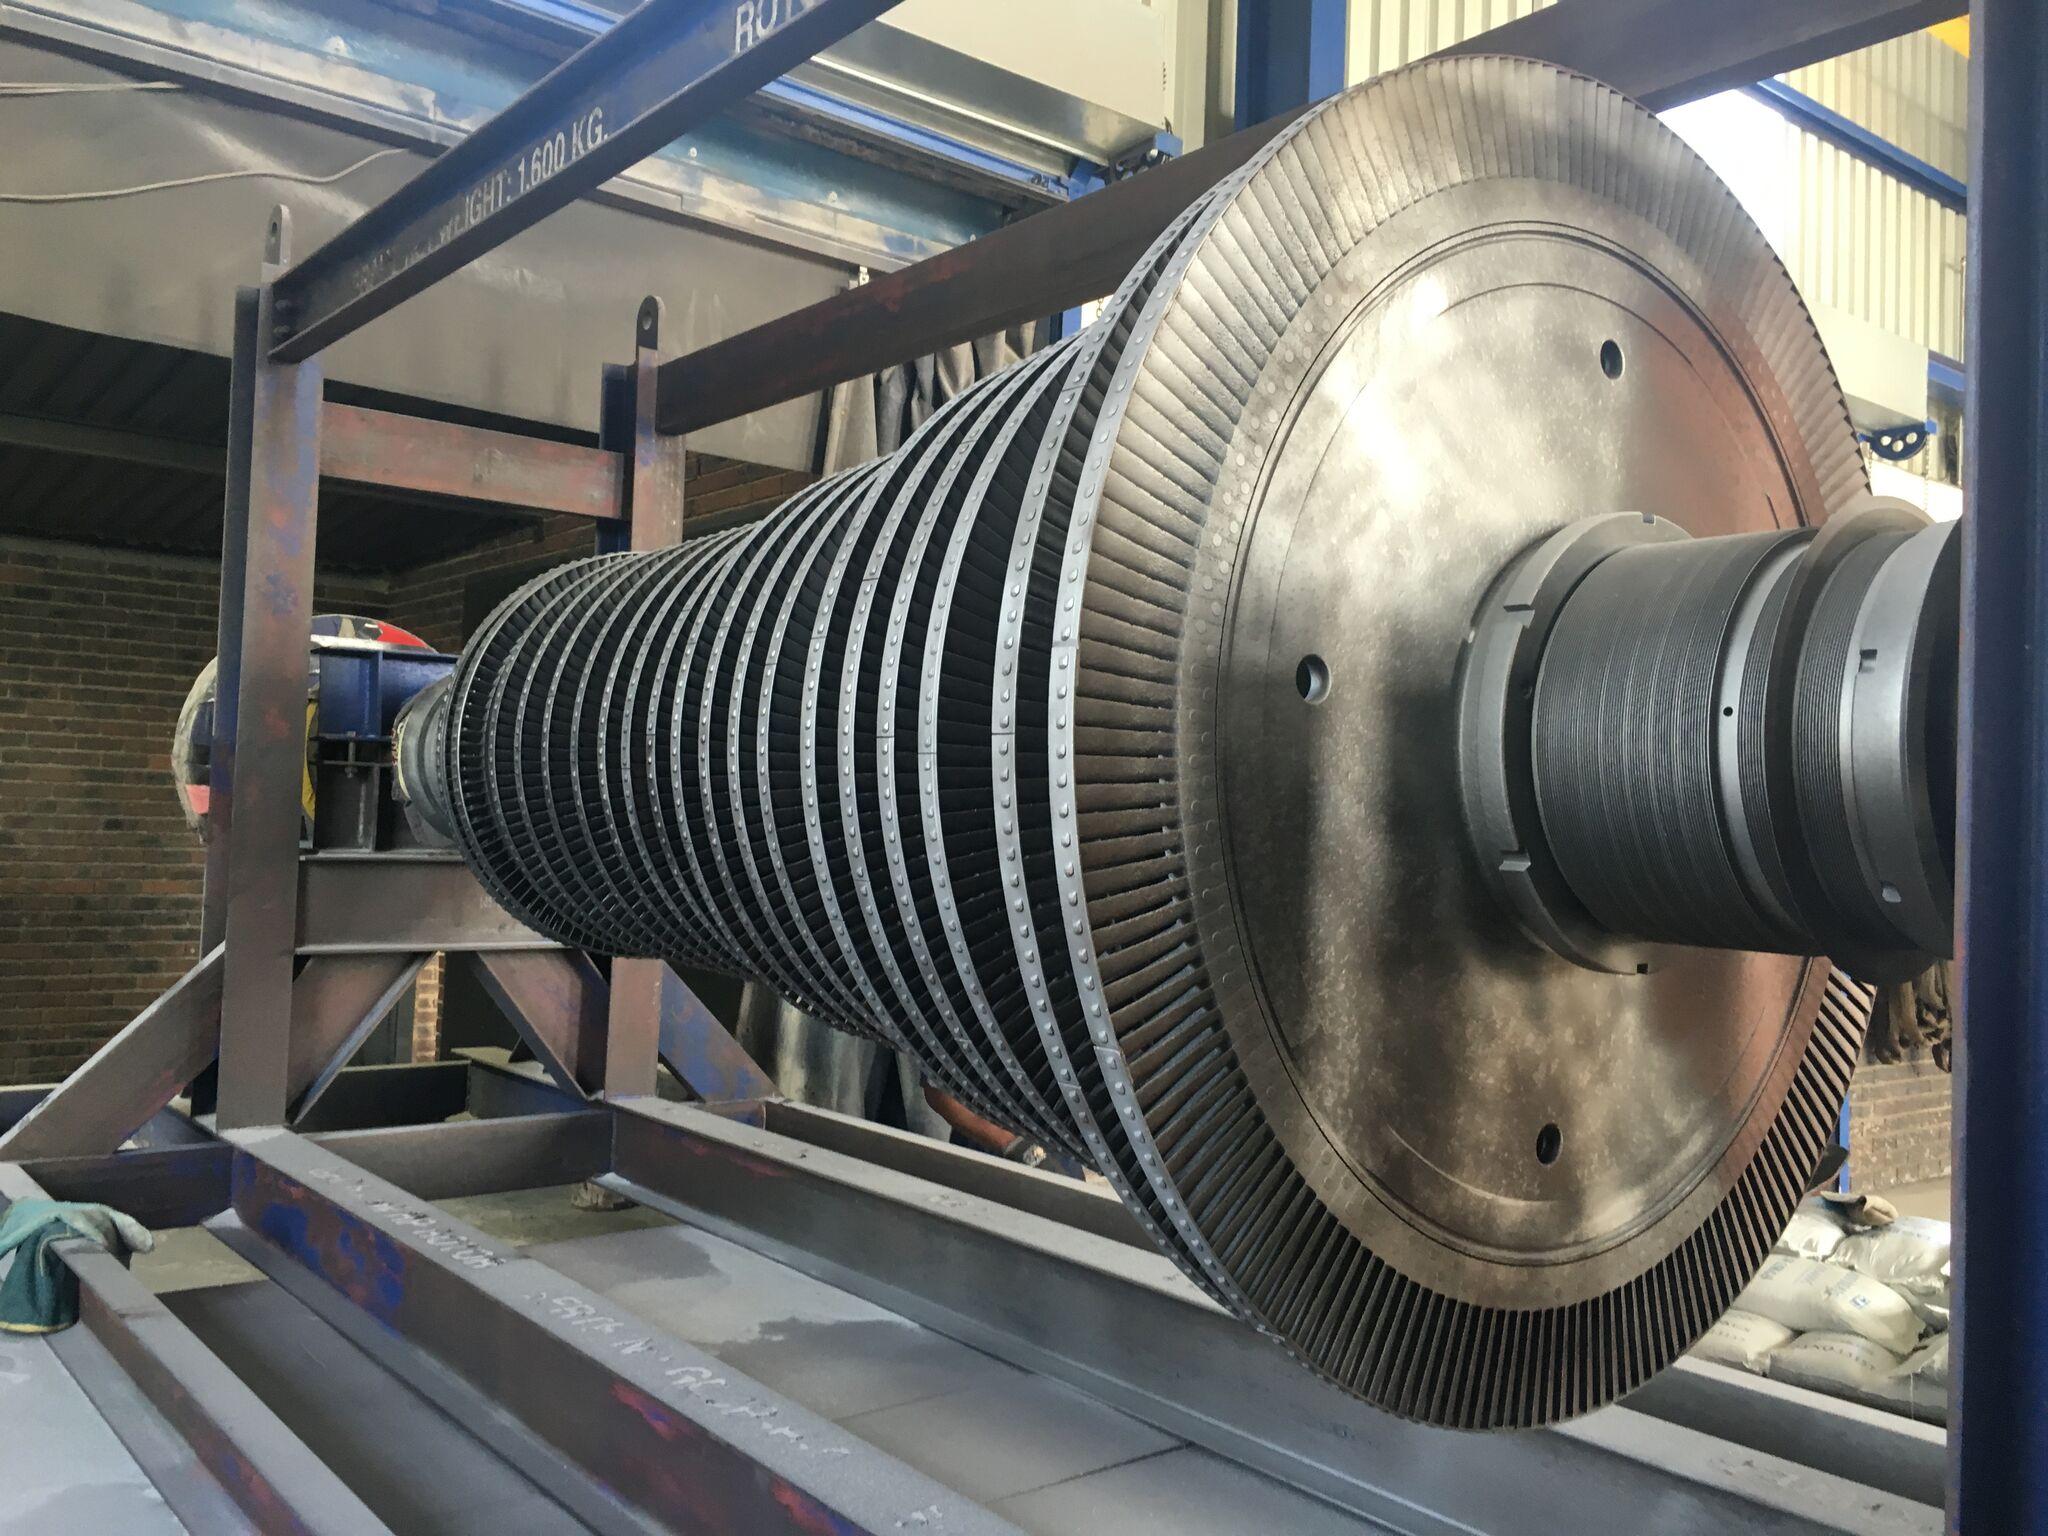 Glass bead blasting turbine rotor